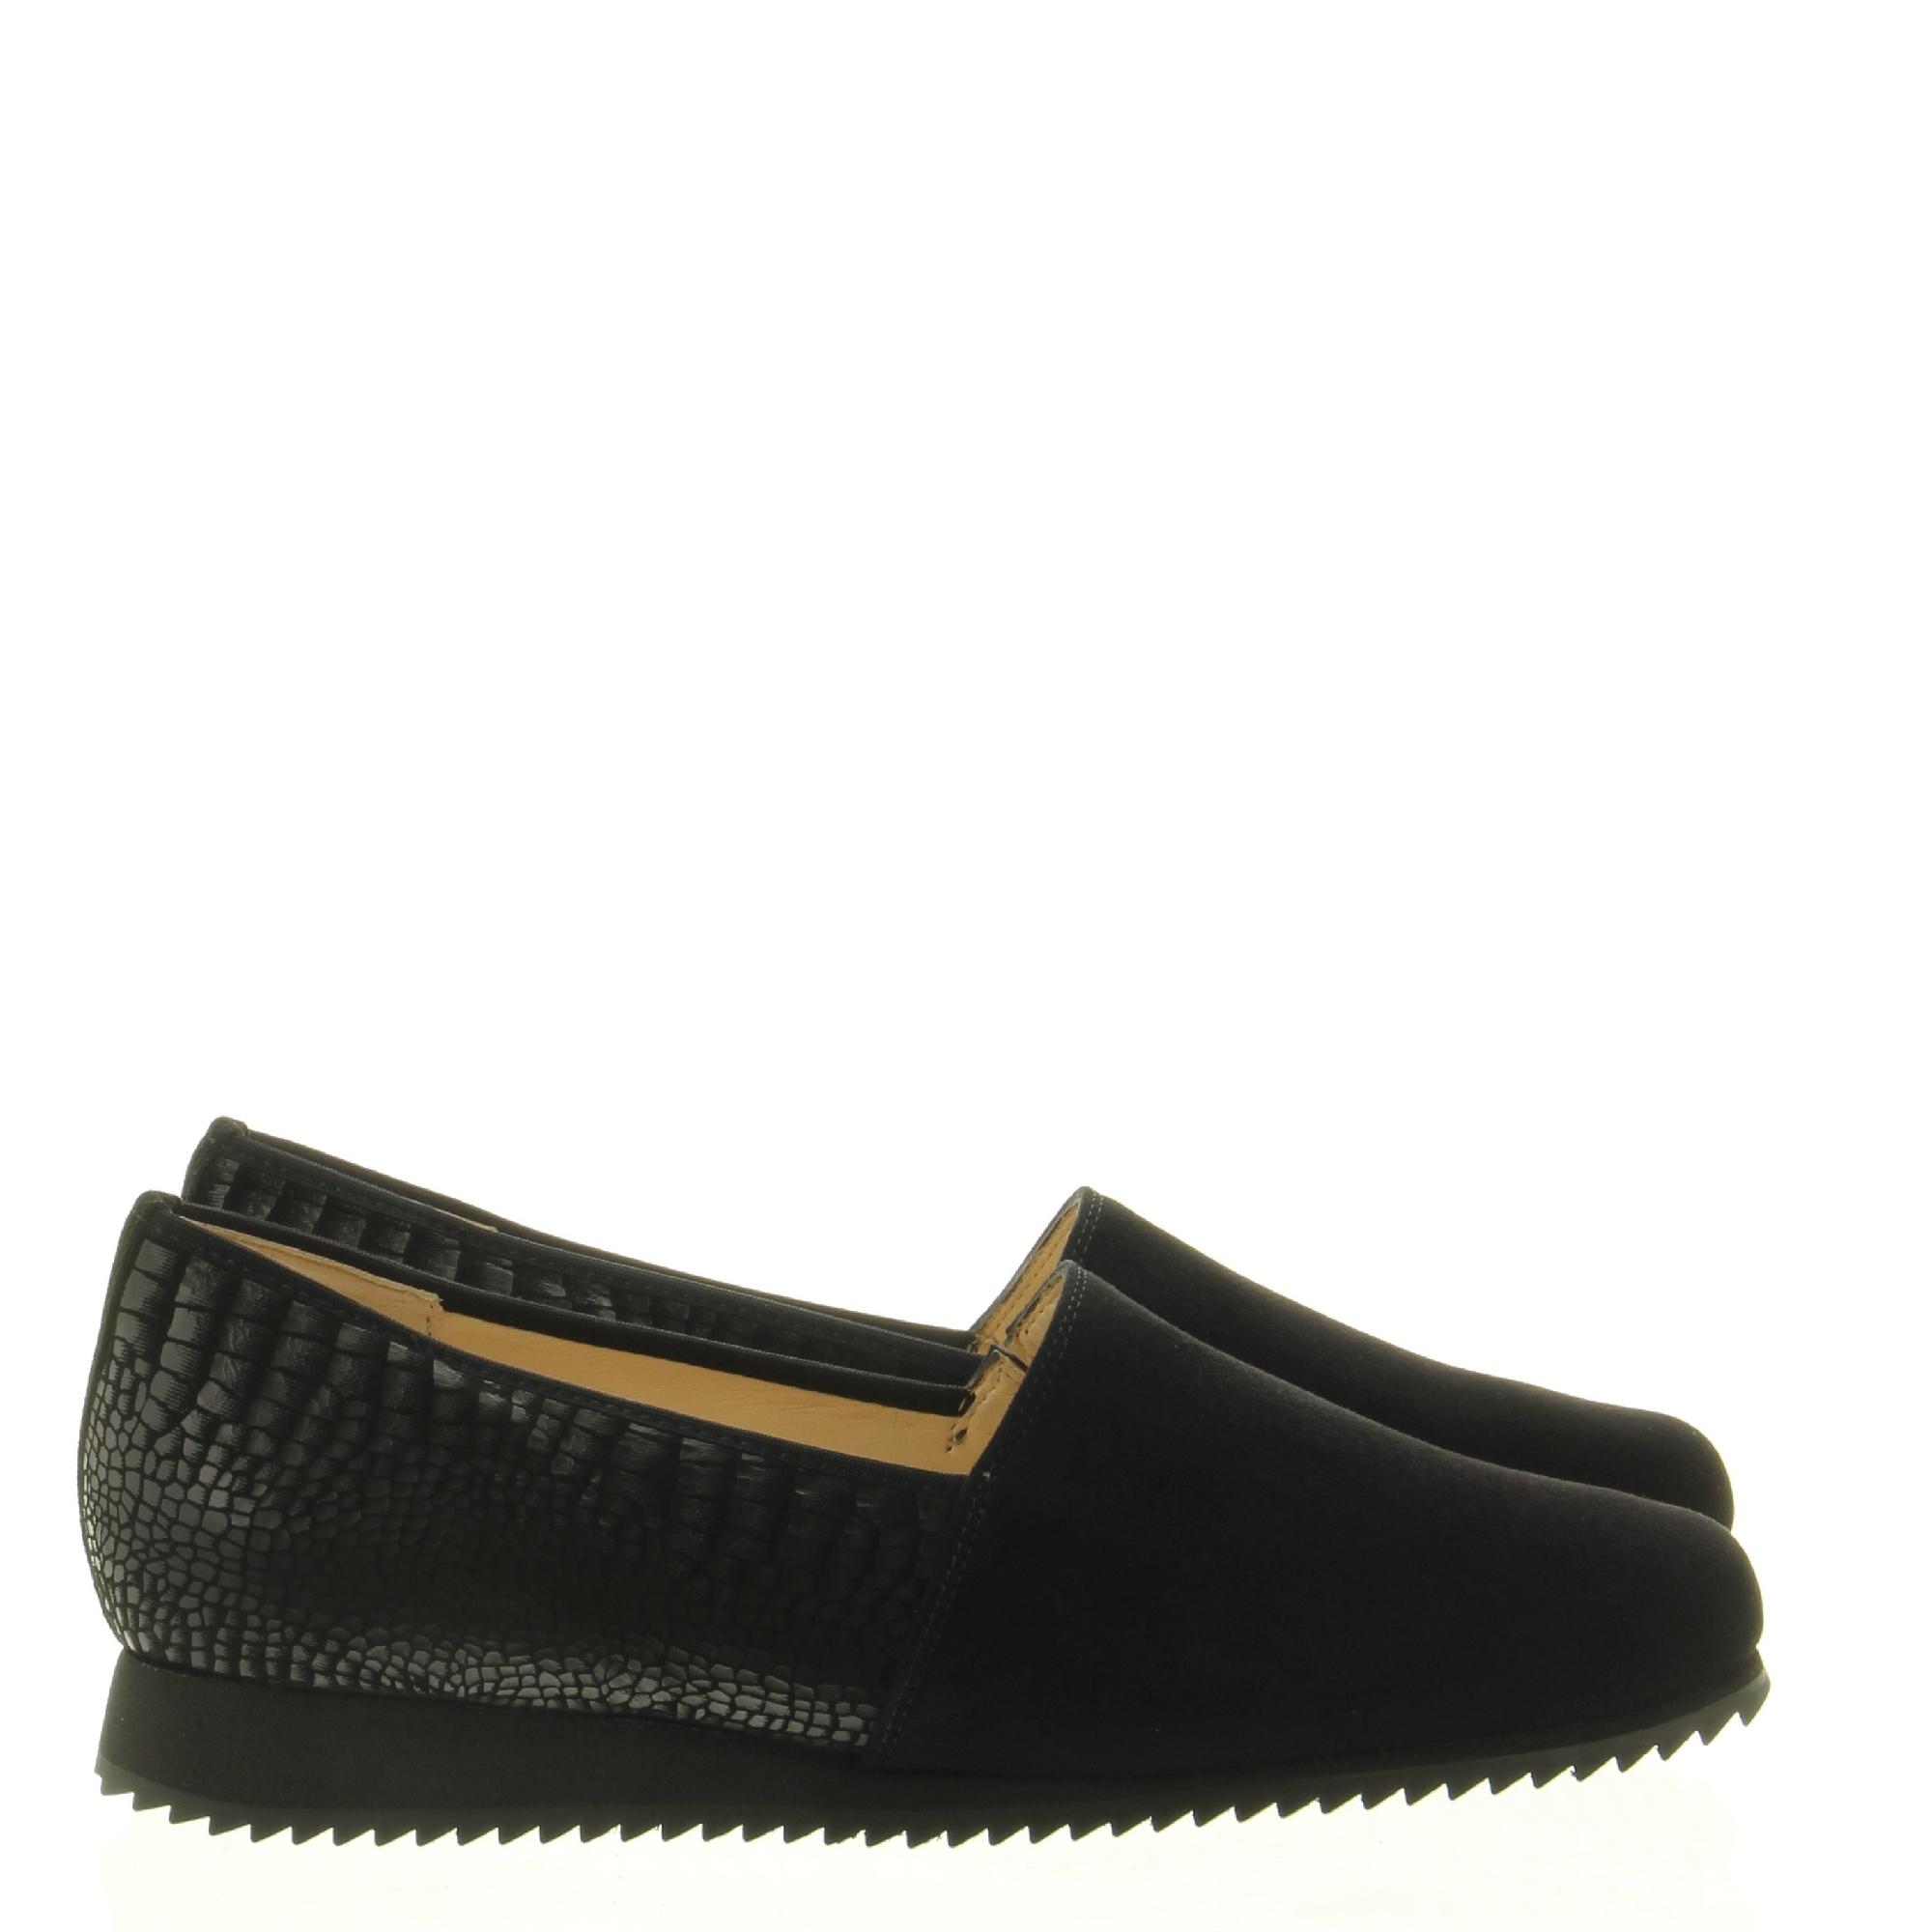 Hassia Shoes 301683 Piacenza 0100 Schwarz Jungle